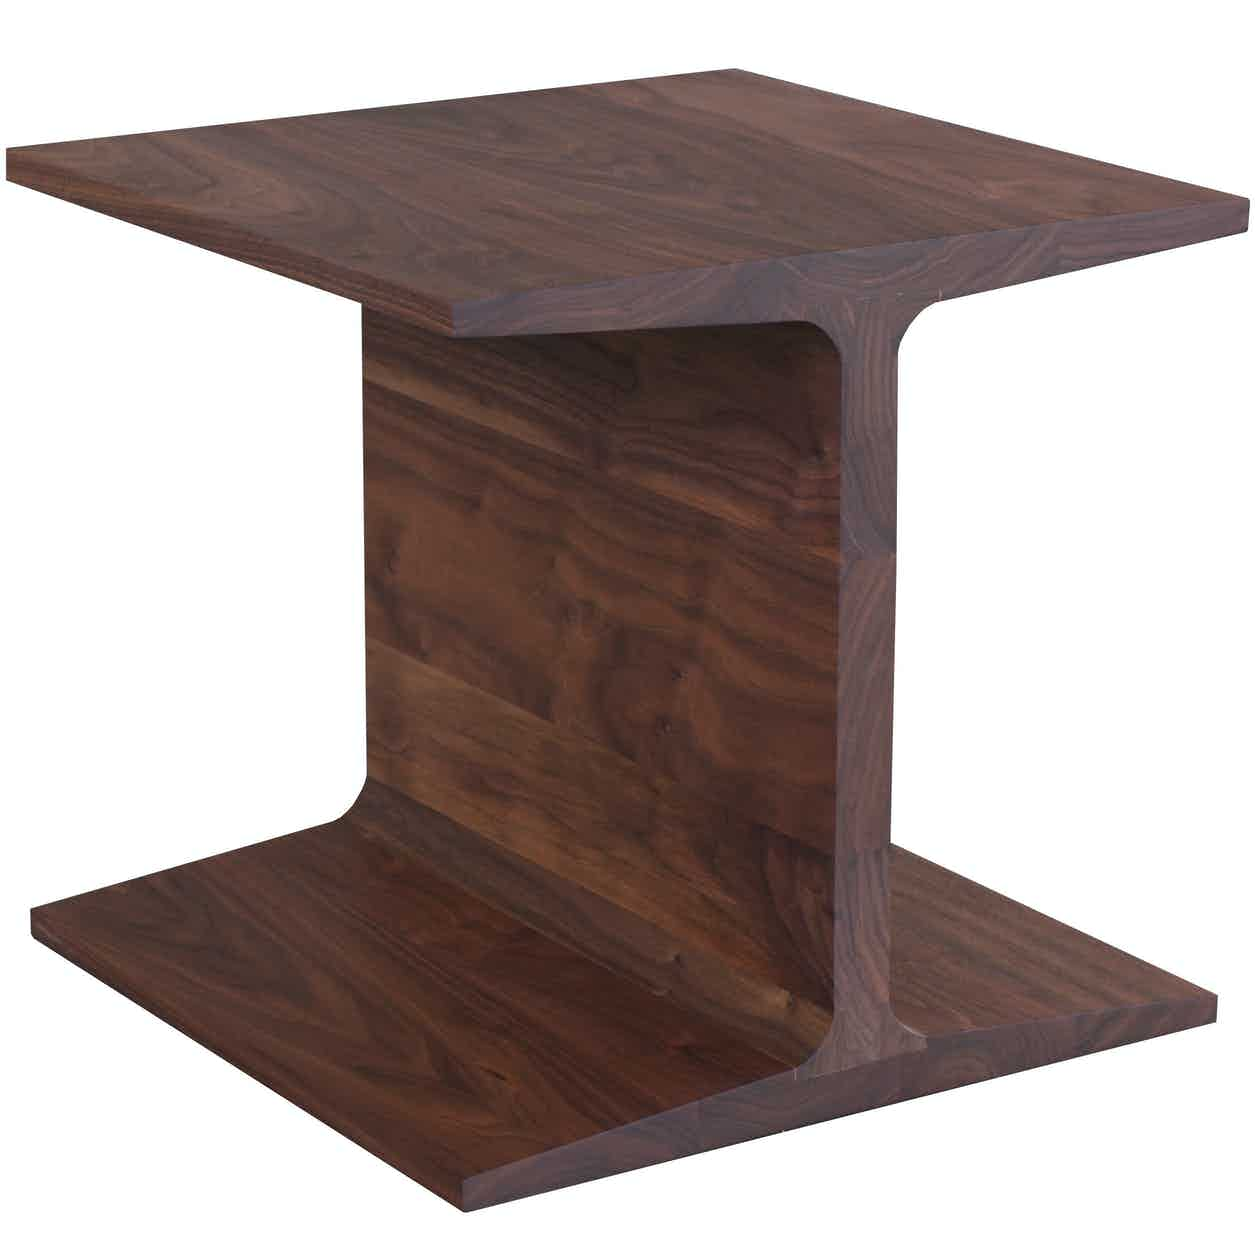 De la espada matthew hilton i beam side table chestnut haute living